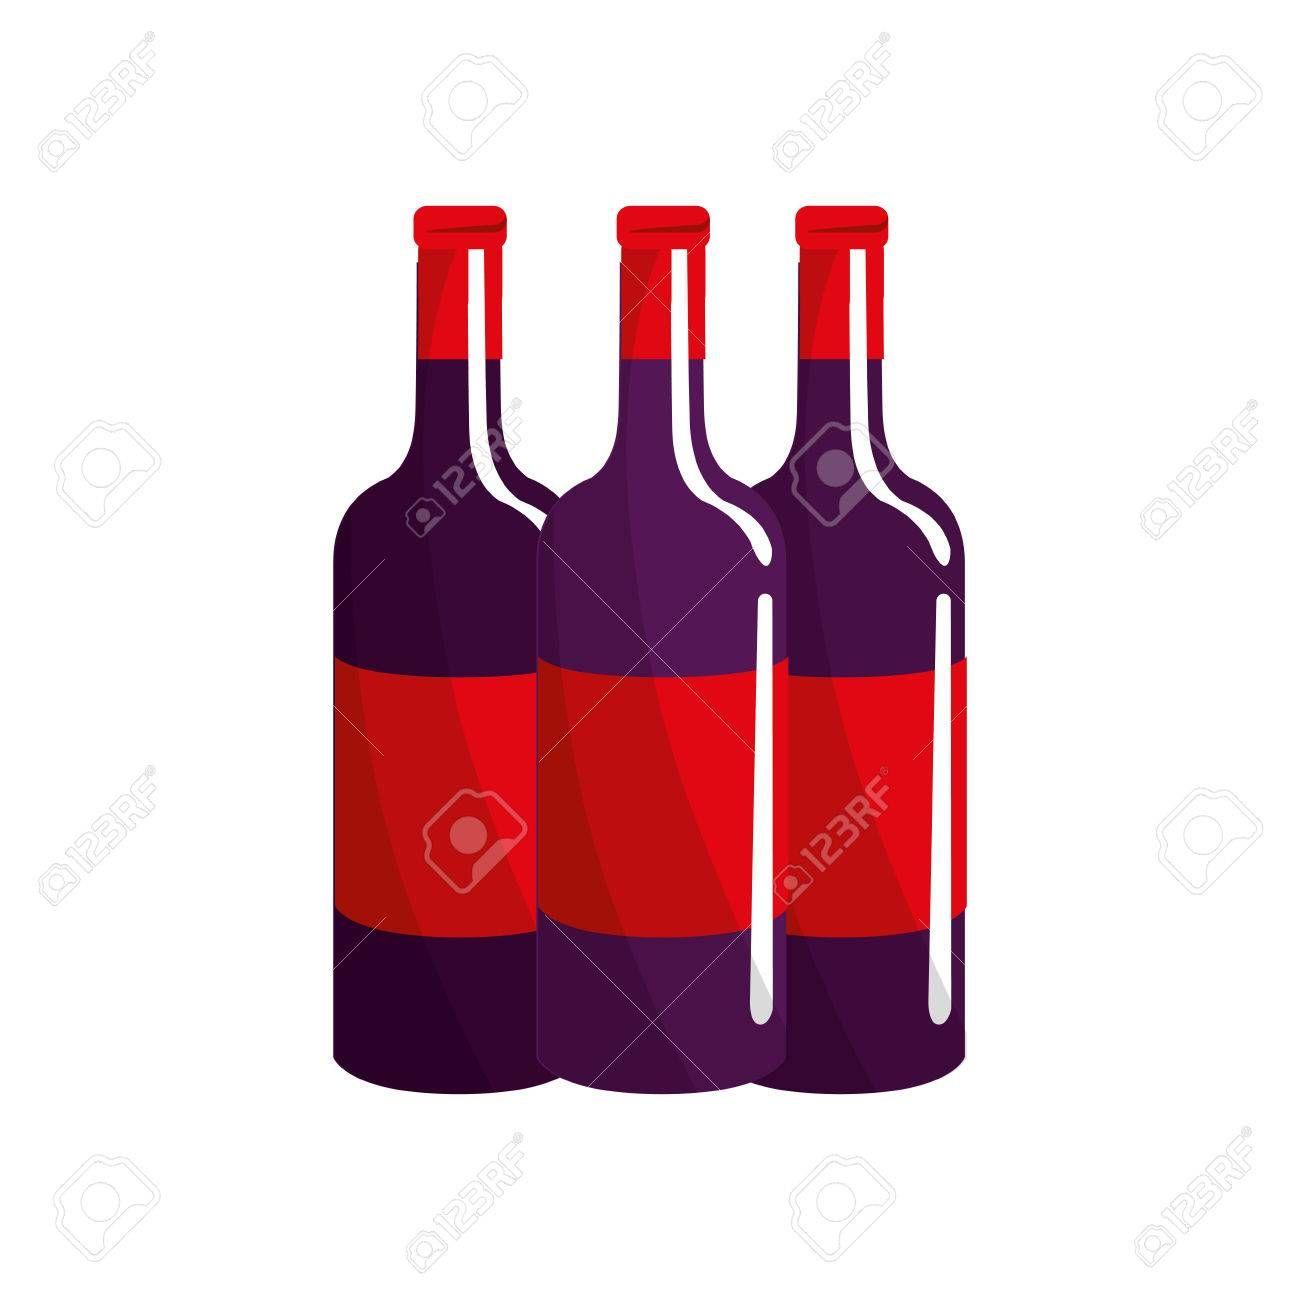 Wine Bottles Taste Beverage Spon Bottles Wine Beverage Taste In 2020 Wine Bottle Alcoholic Drinks Bottle